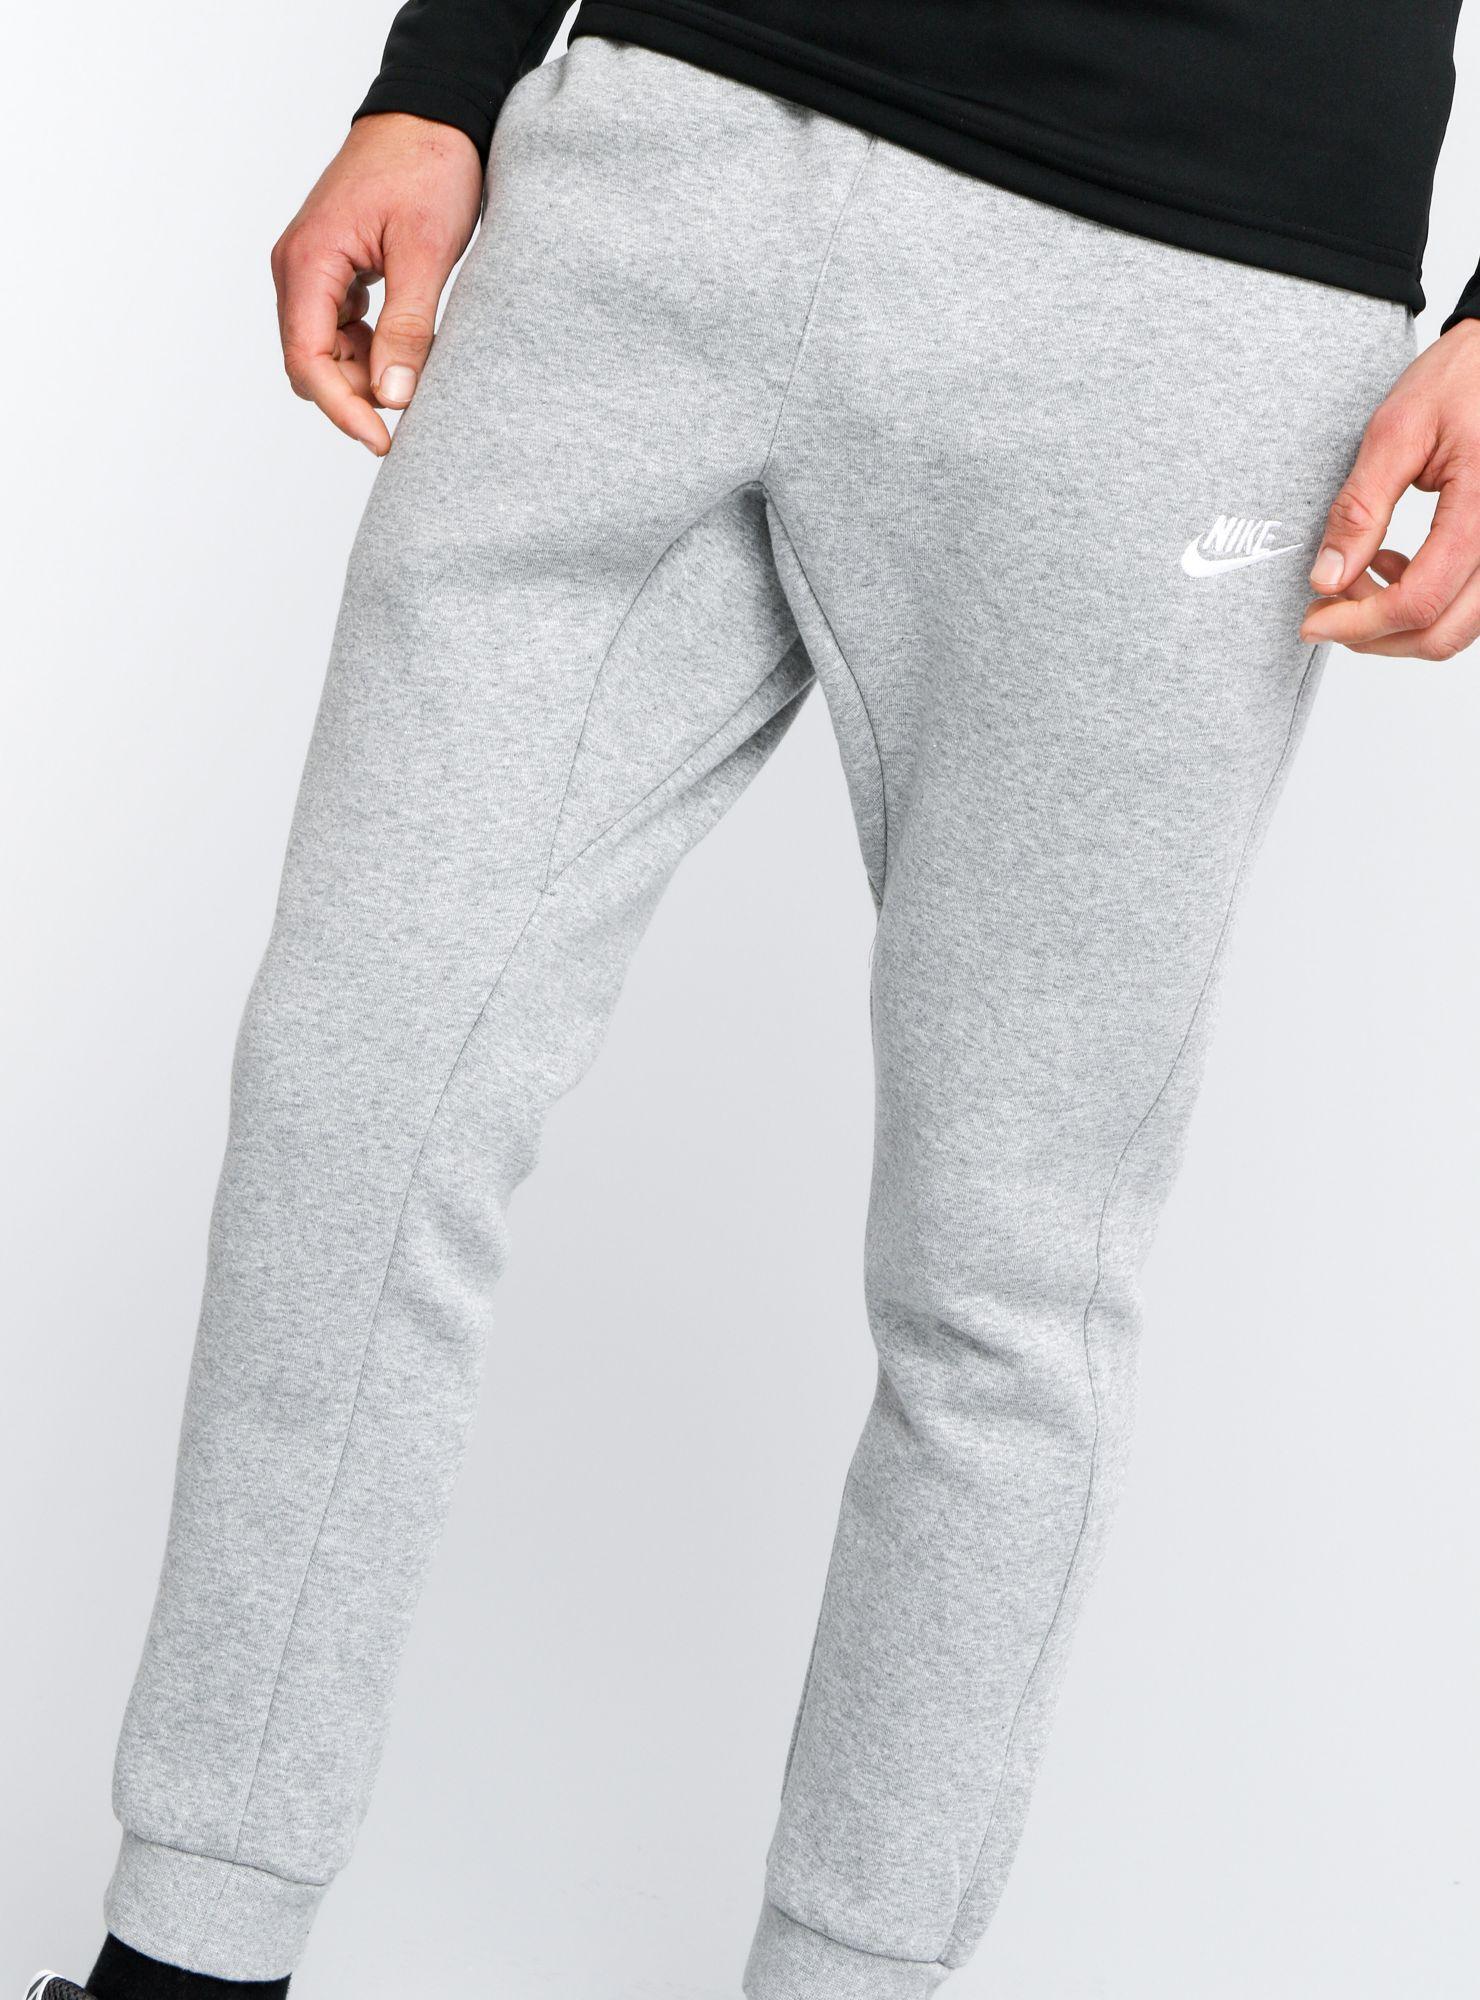 Pantalón Jogger Flc Training Paris Nike Pantalones Hombre Y Buzos rgqvrwOBn